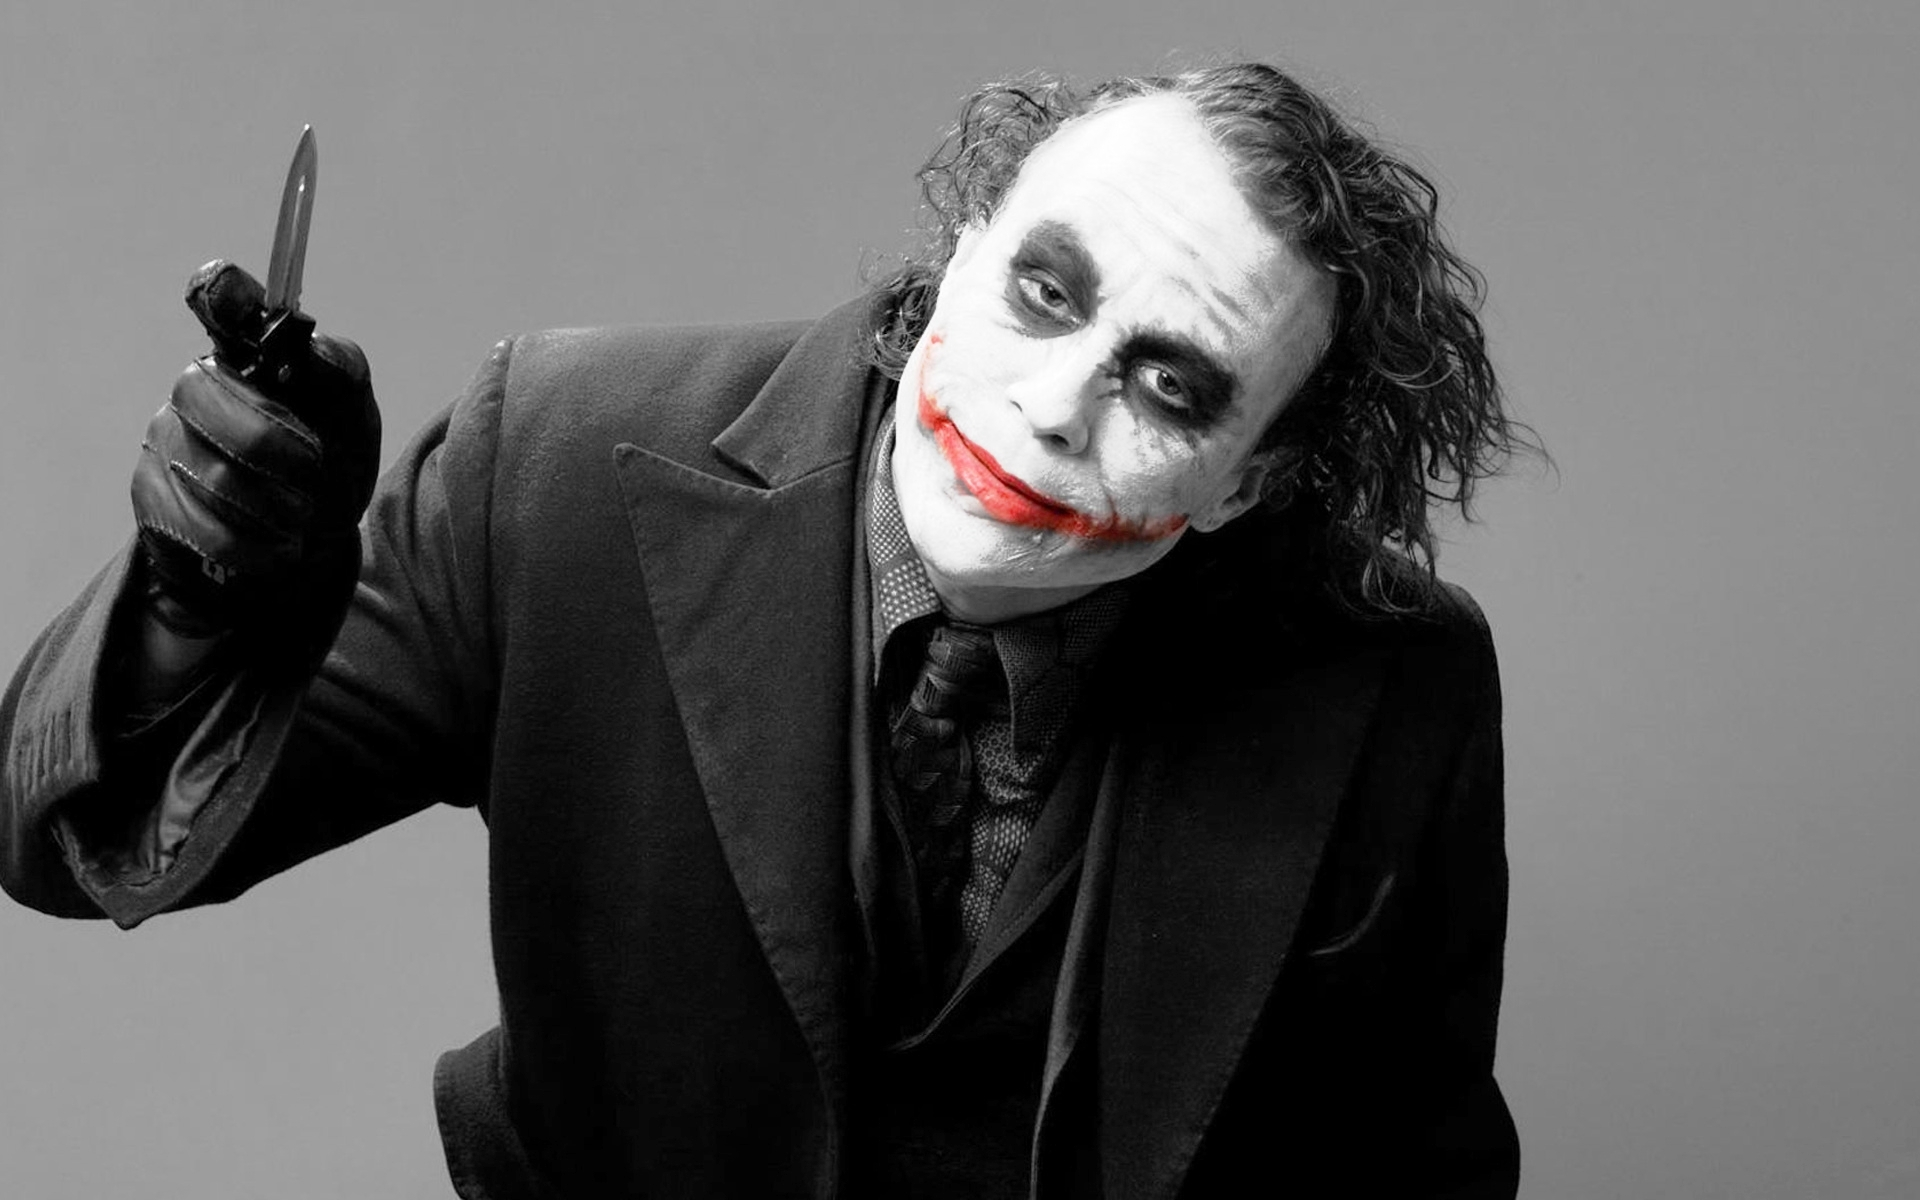 Joker Heath Ledger Wallpaper Posted By Samantha Sellers